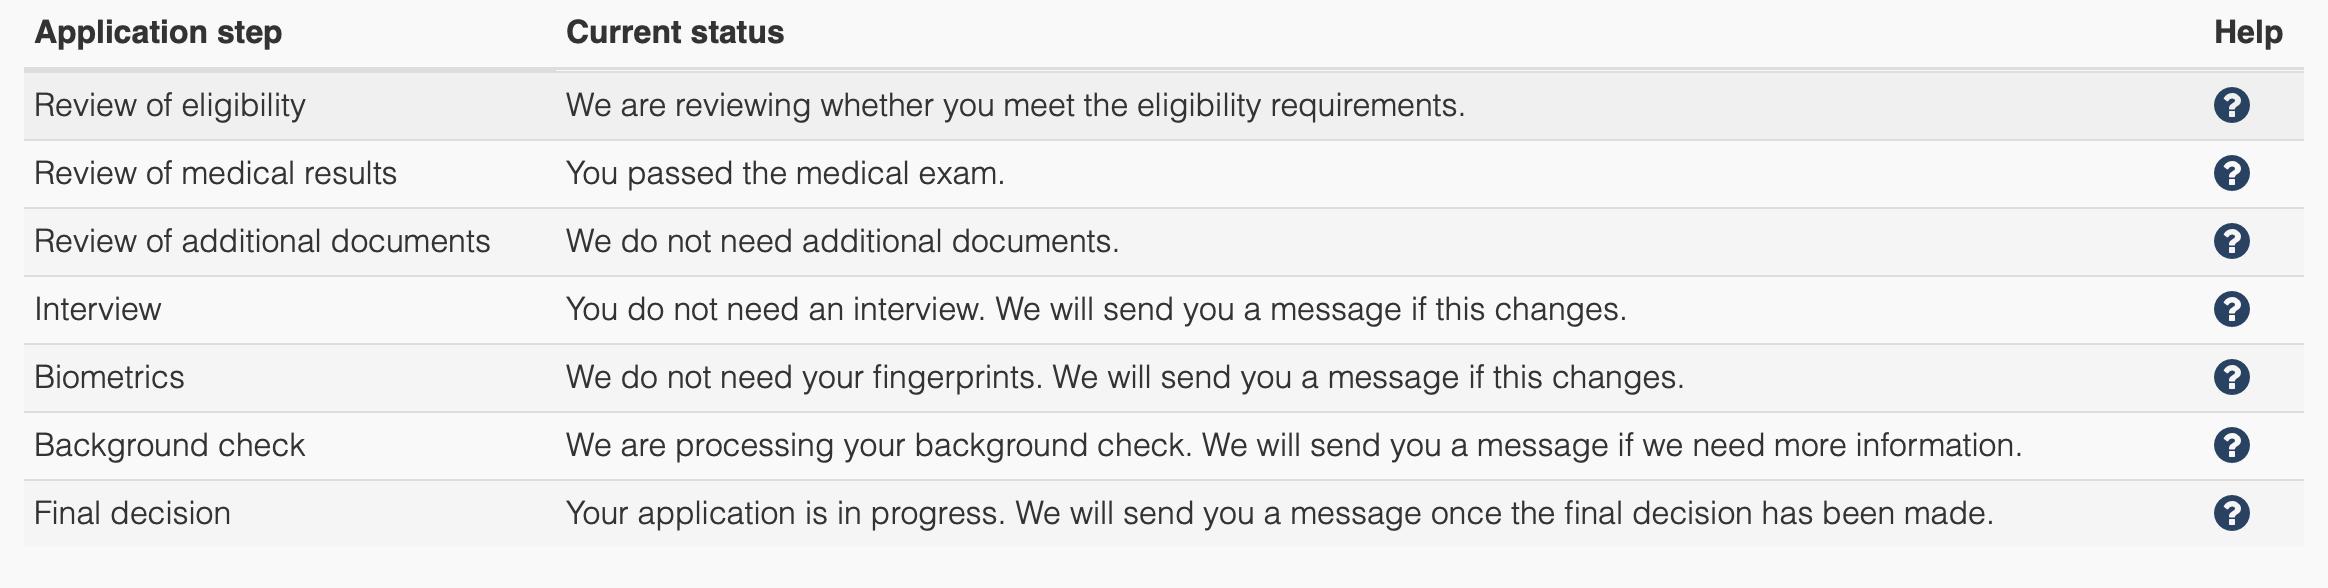 partner visa application information for permanent stage processing 2017